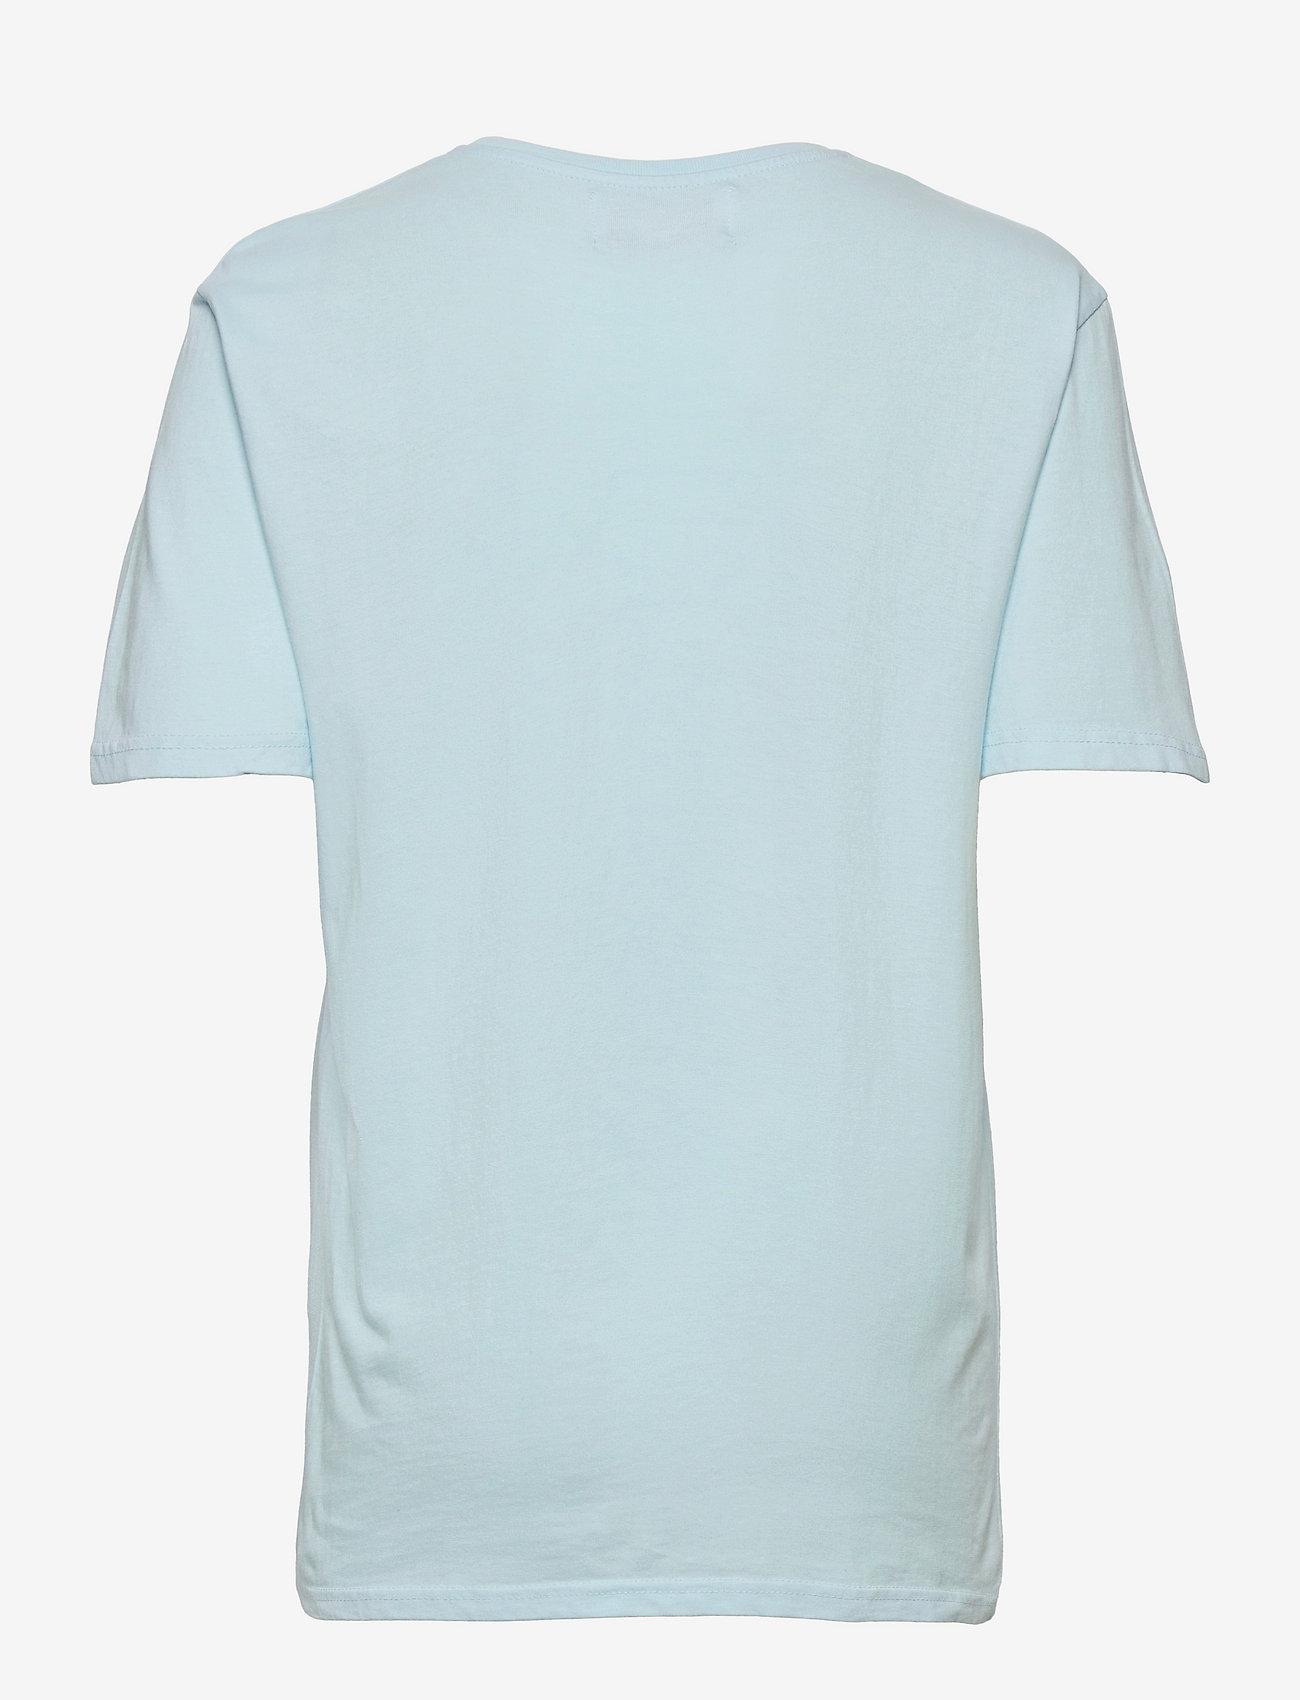 BALL - BALL RIMINI NASH TEE - t-shirts basiques - ice blue - 1